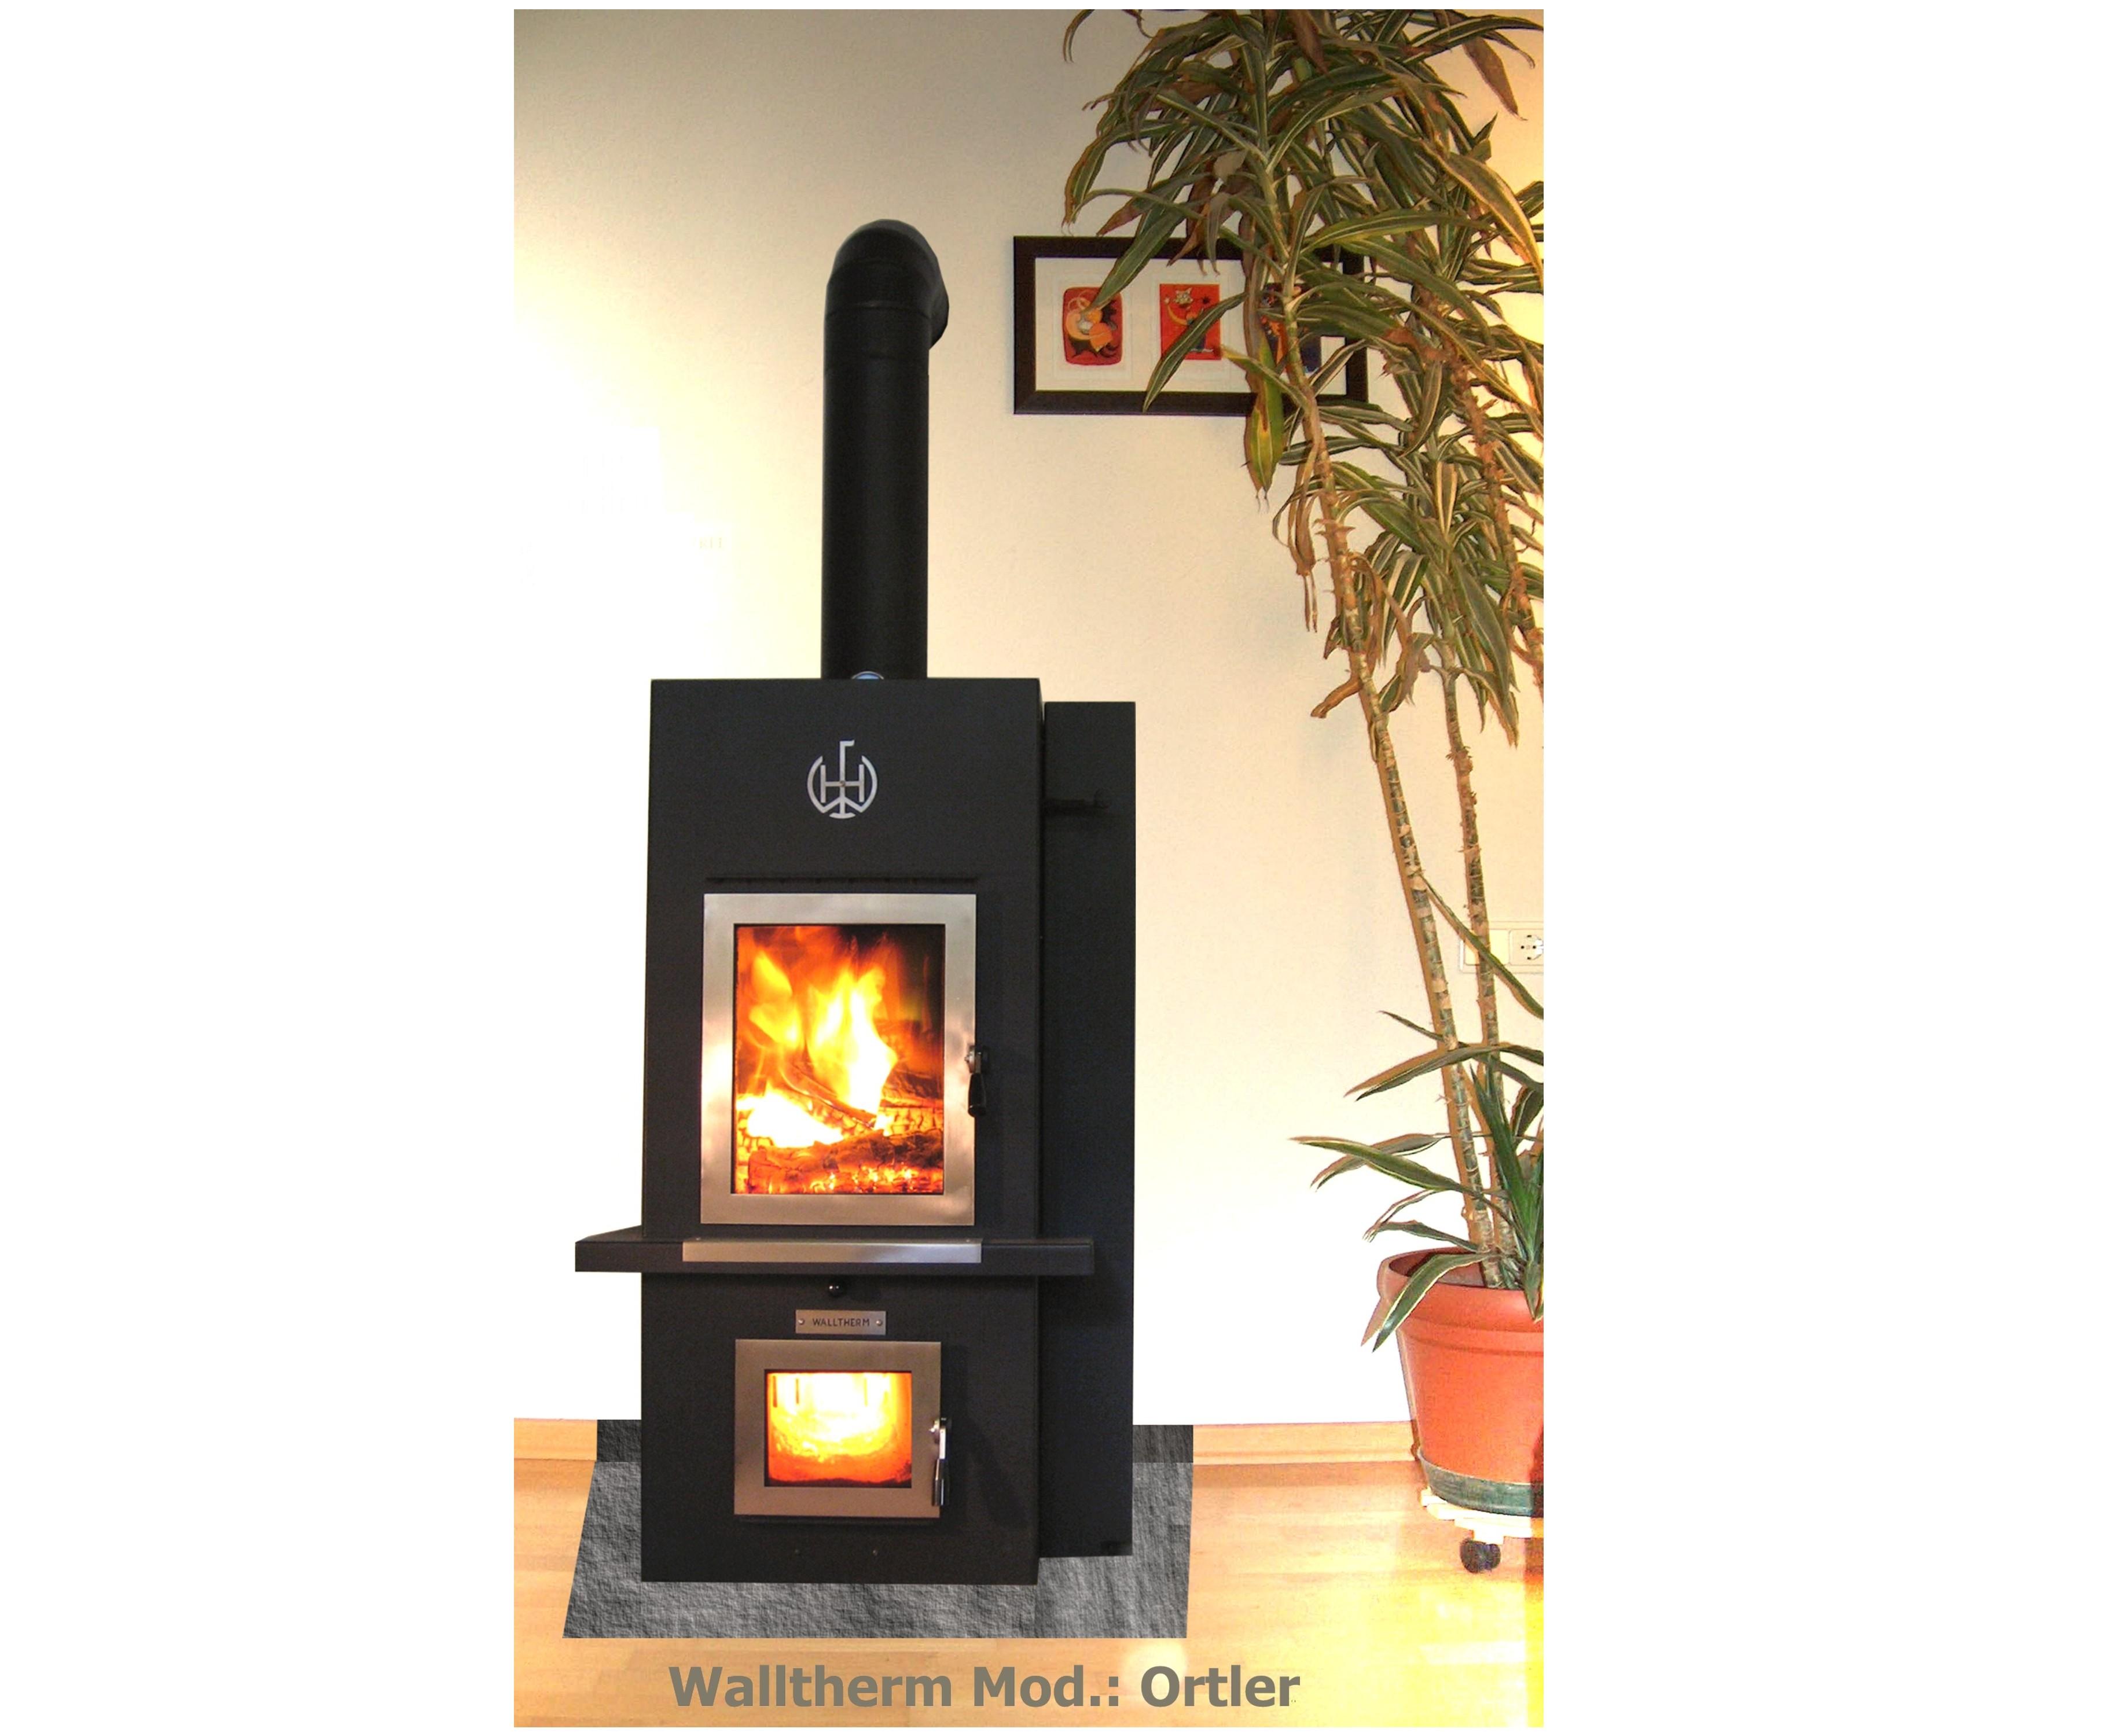 id no 0000022361 walln fer h f gmbh energiesysteme certipedia. Black Bedroom Furniture Sets. Home Design Ideas